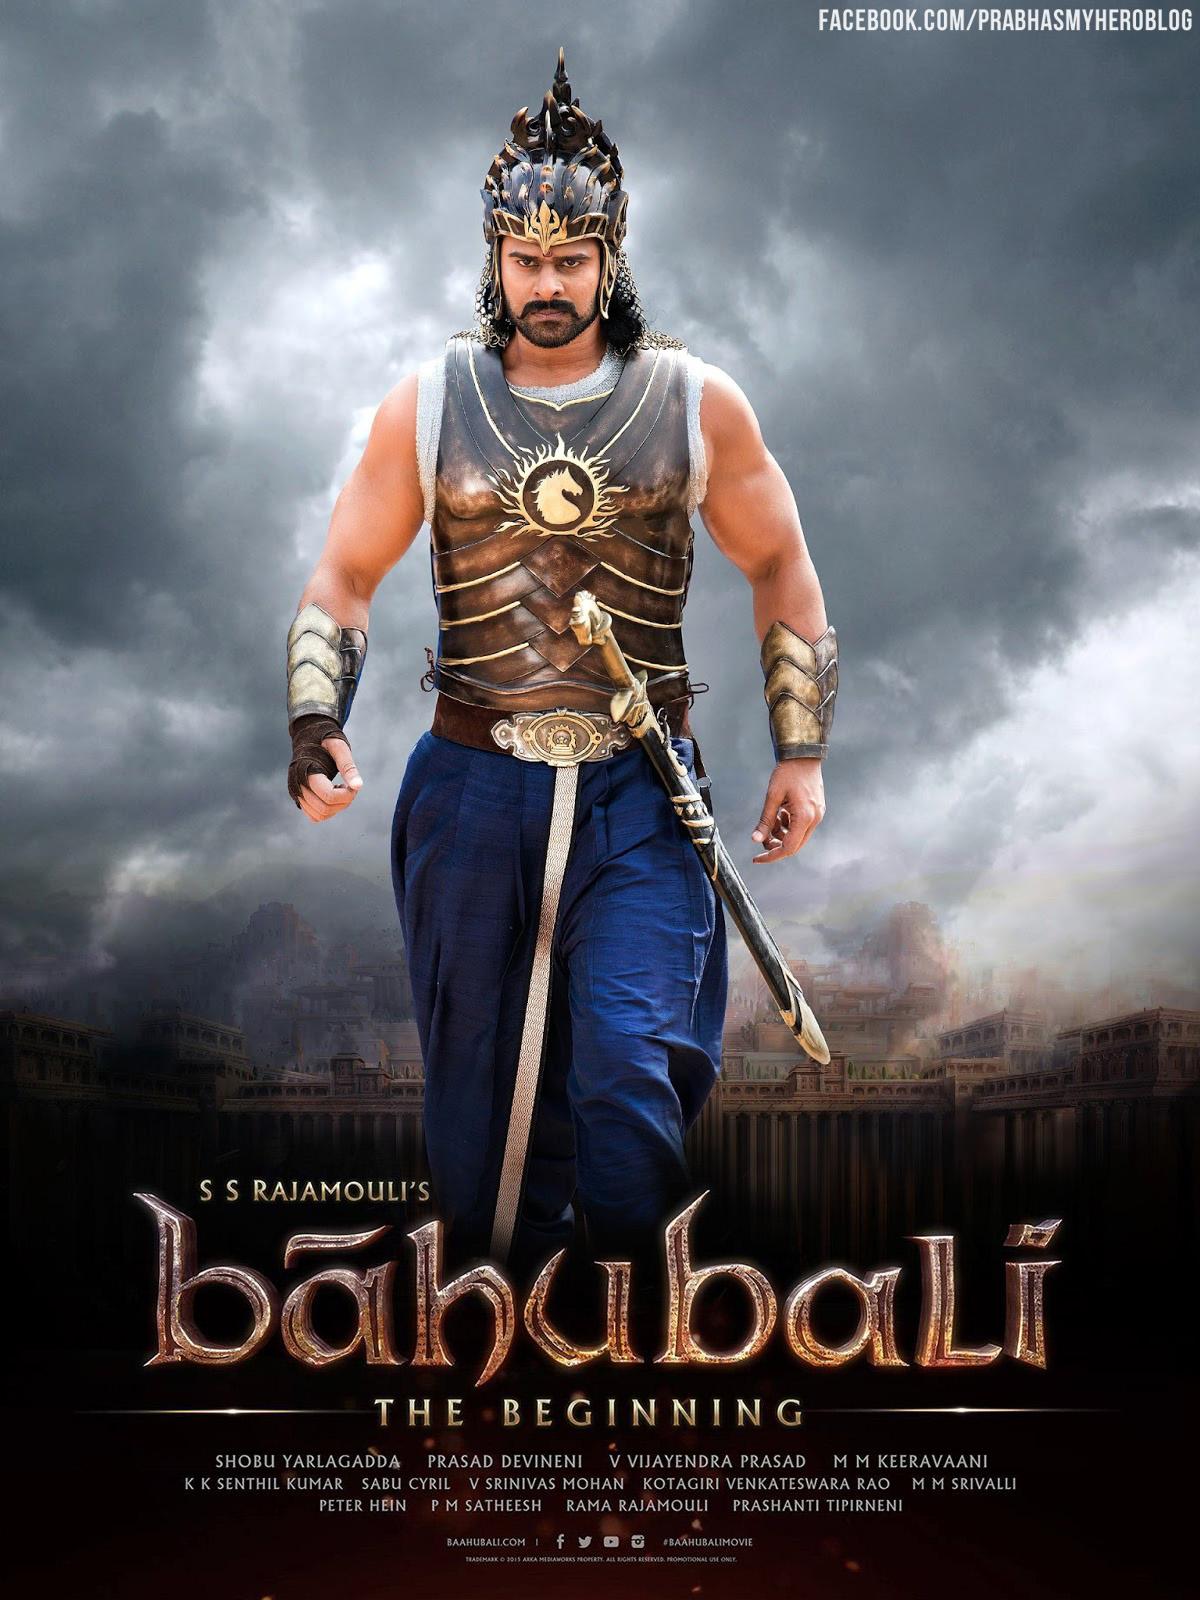 Prabhasmyhero blog october 2015 - Bahubali 2 poster hd ...